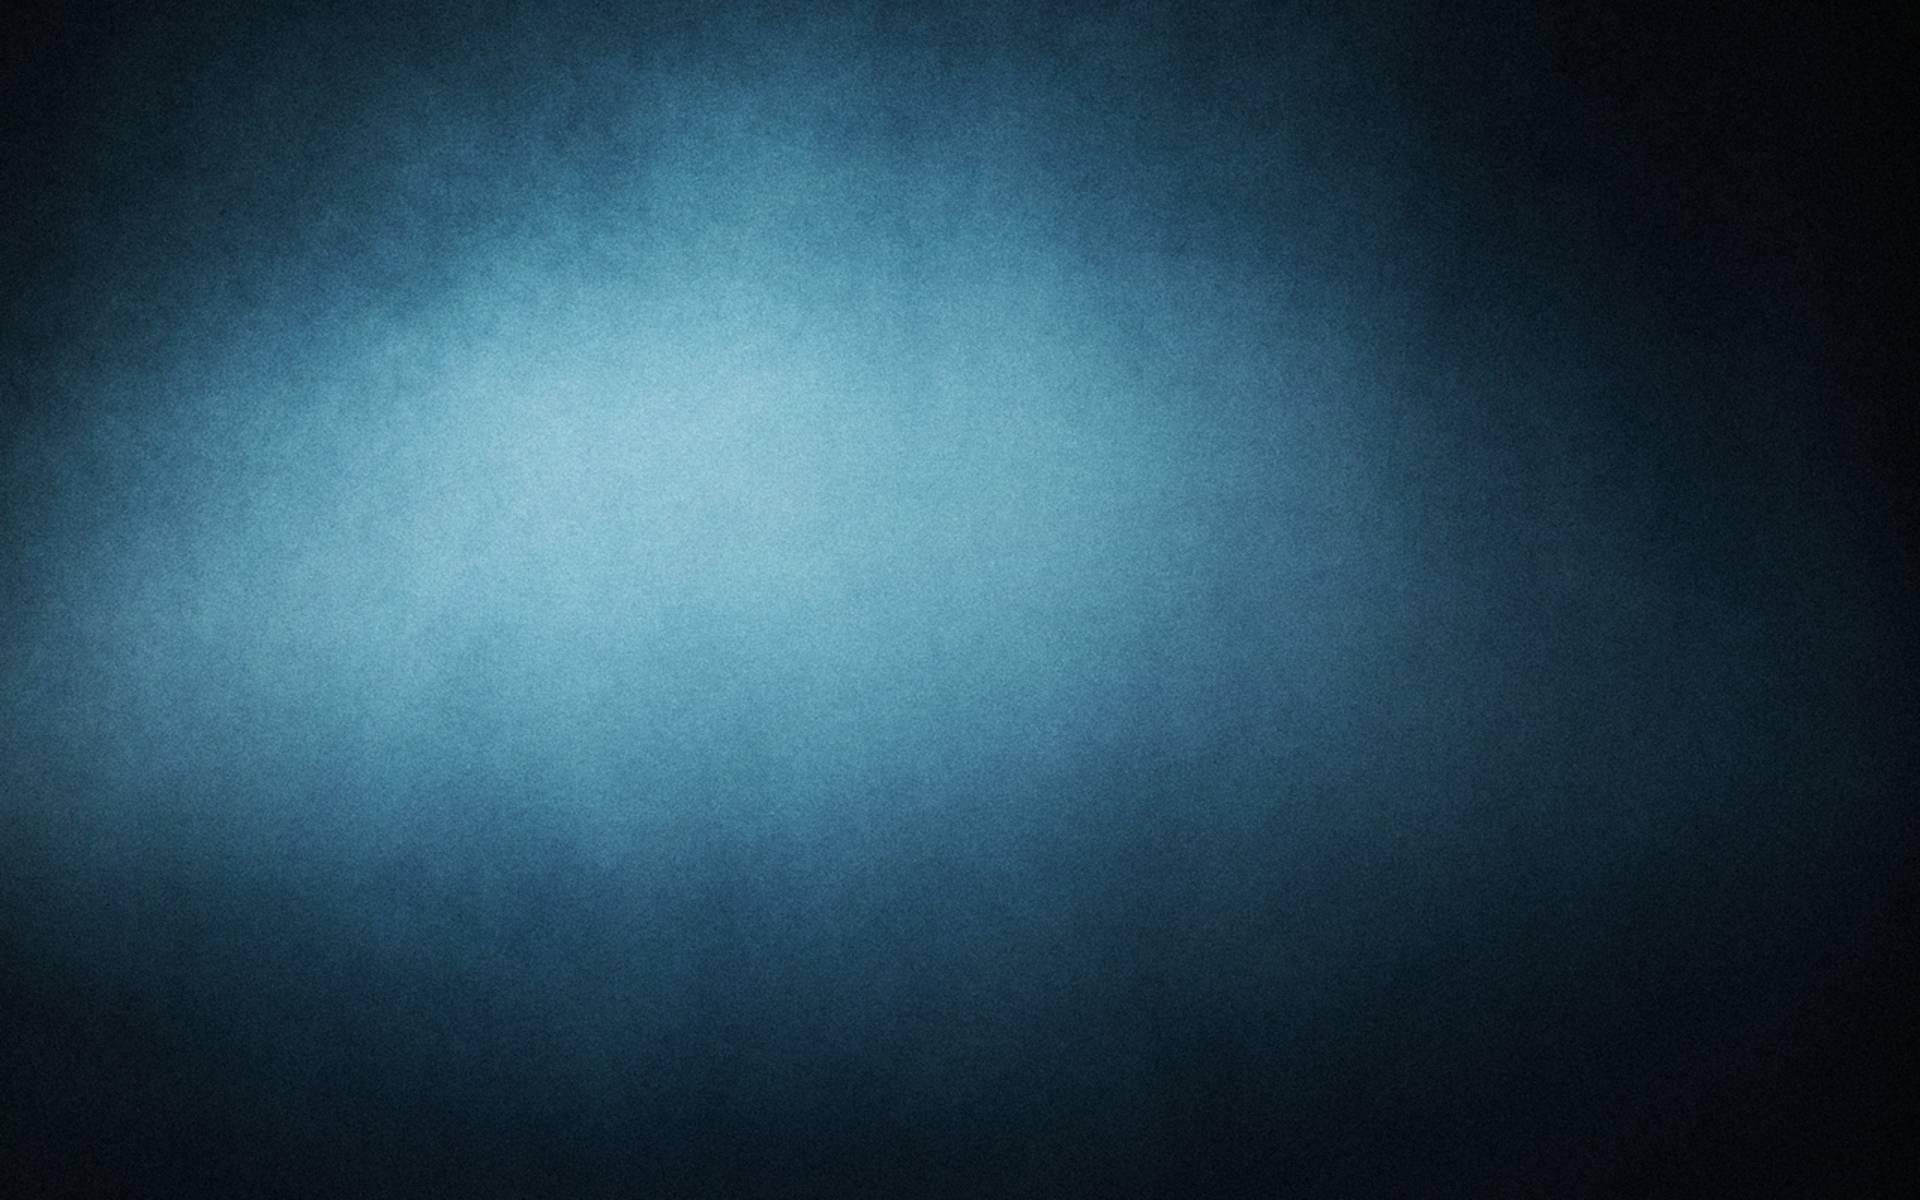 Dark blue poster board